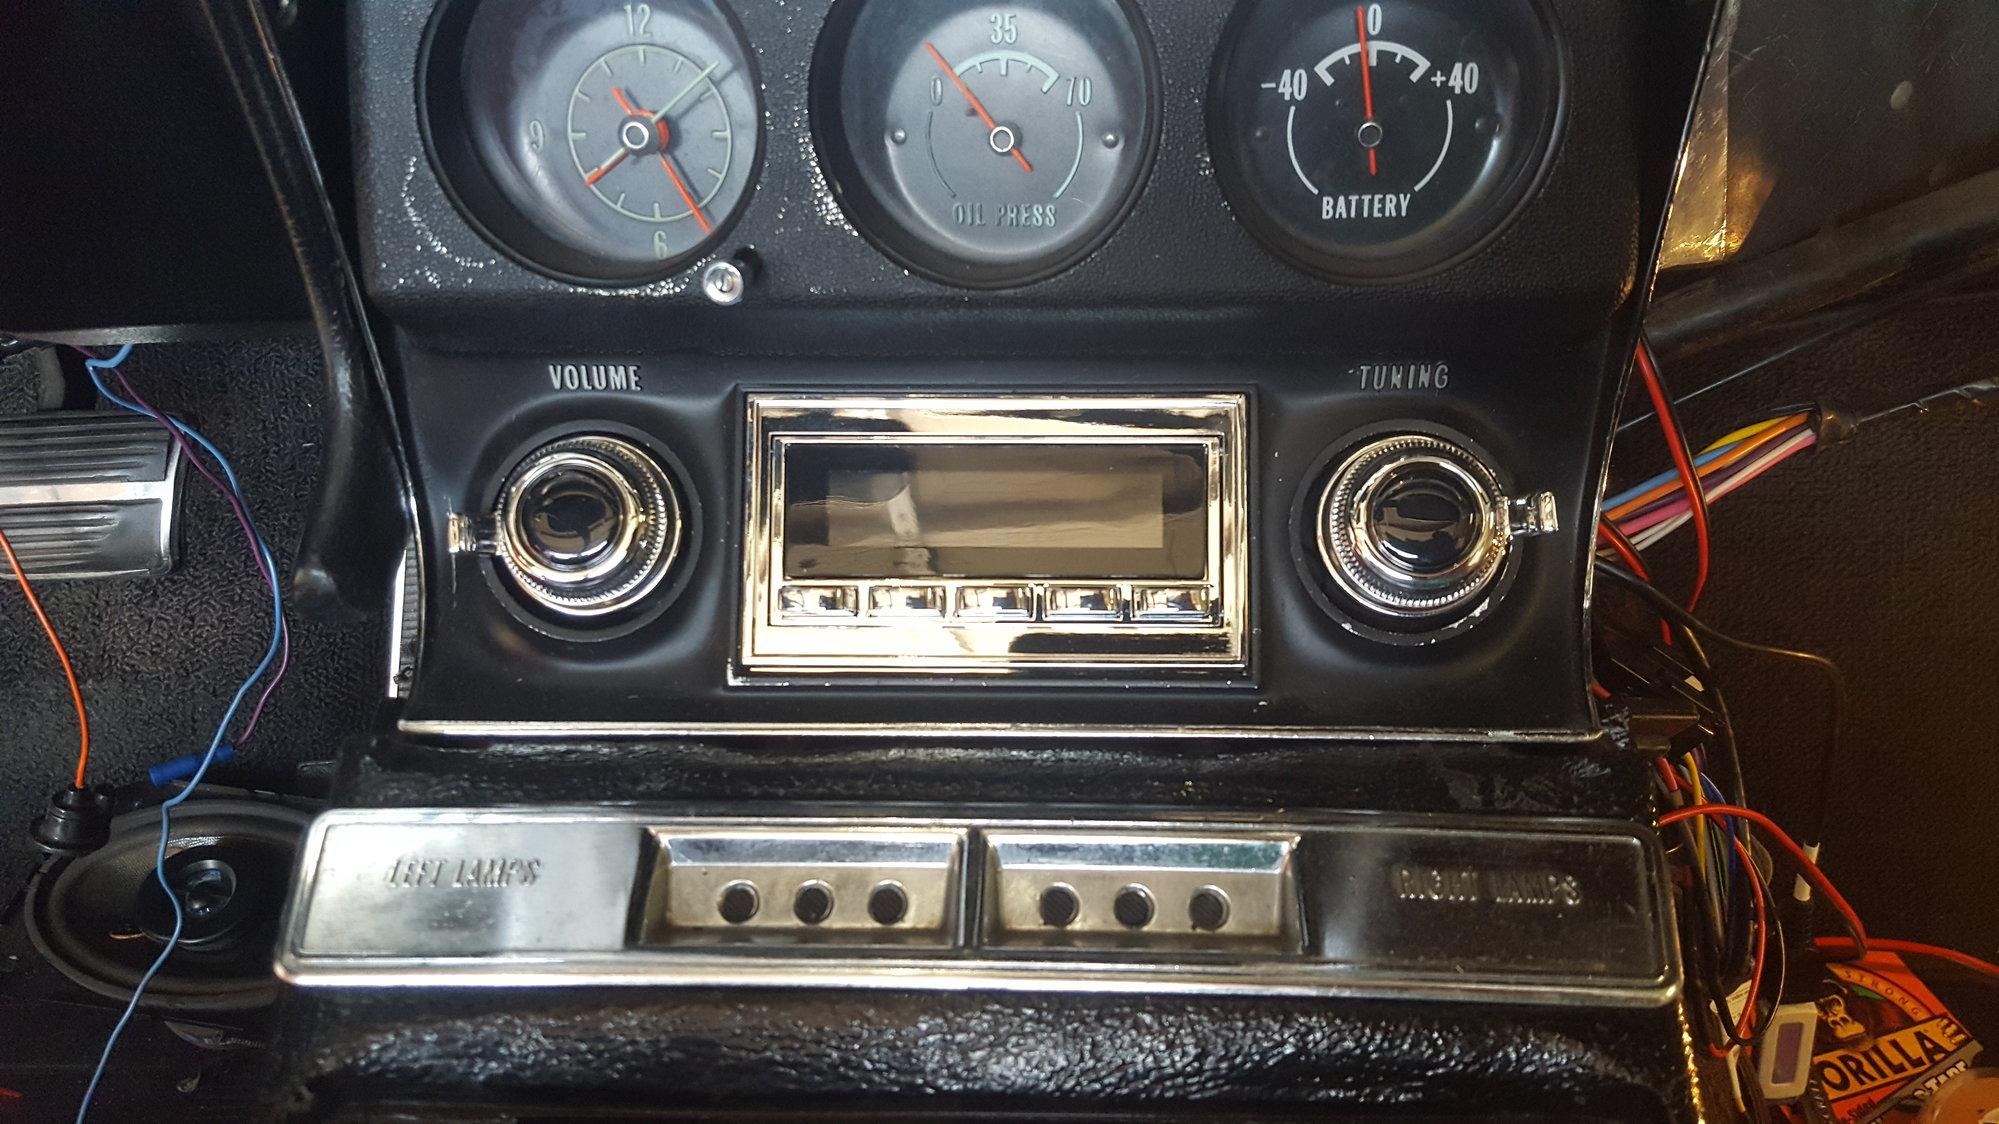 RetroSound Long Beach Radio? - CorvetteForum - Chevrolet Corvette